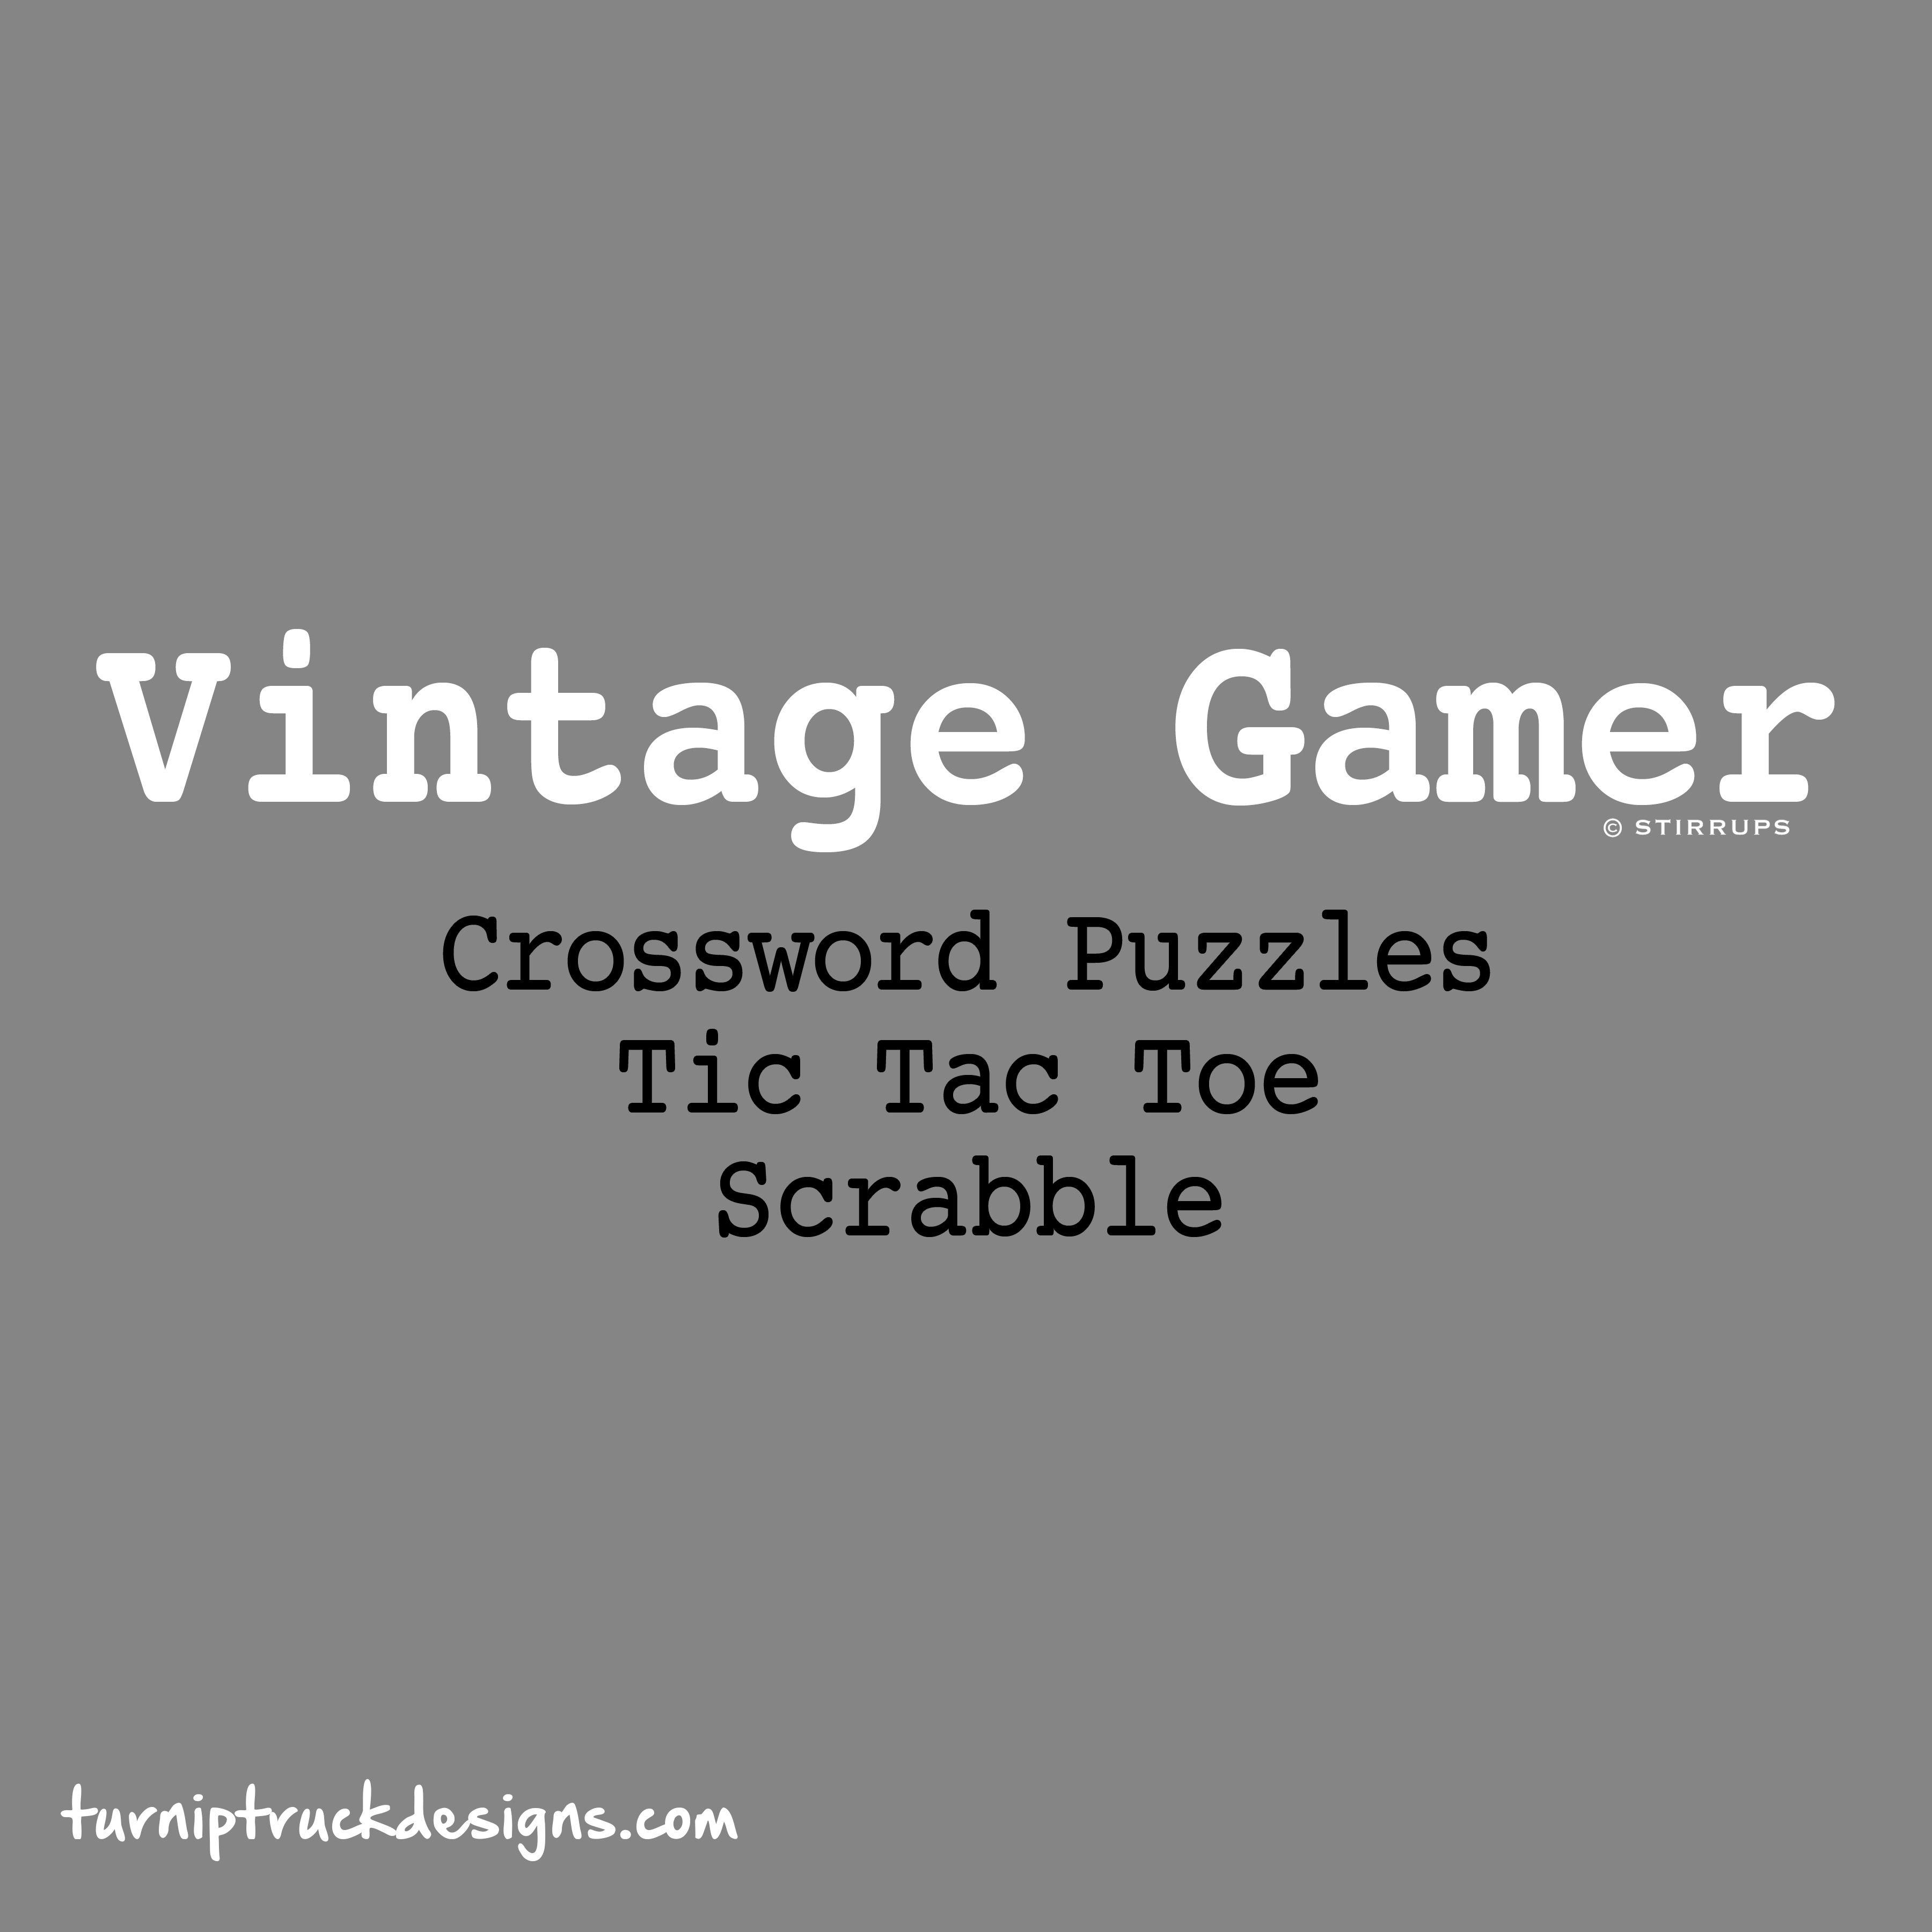 Vintage Gamer: Crossword Puzzles, Tic Tac, Toe, Scrabble Turnip Truck Designs T-shirt